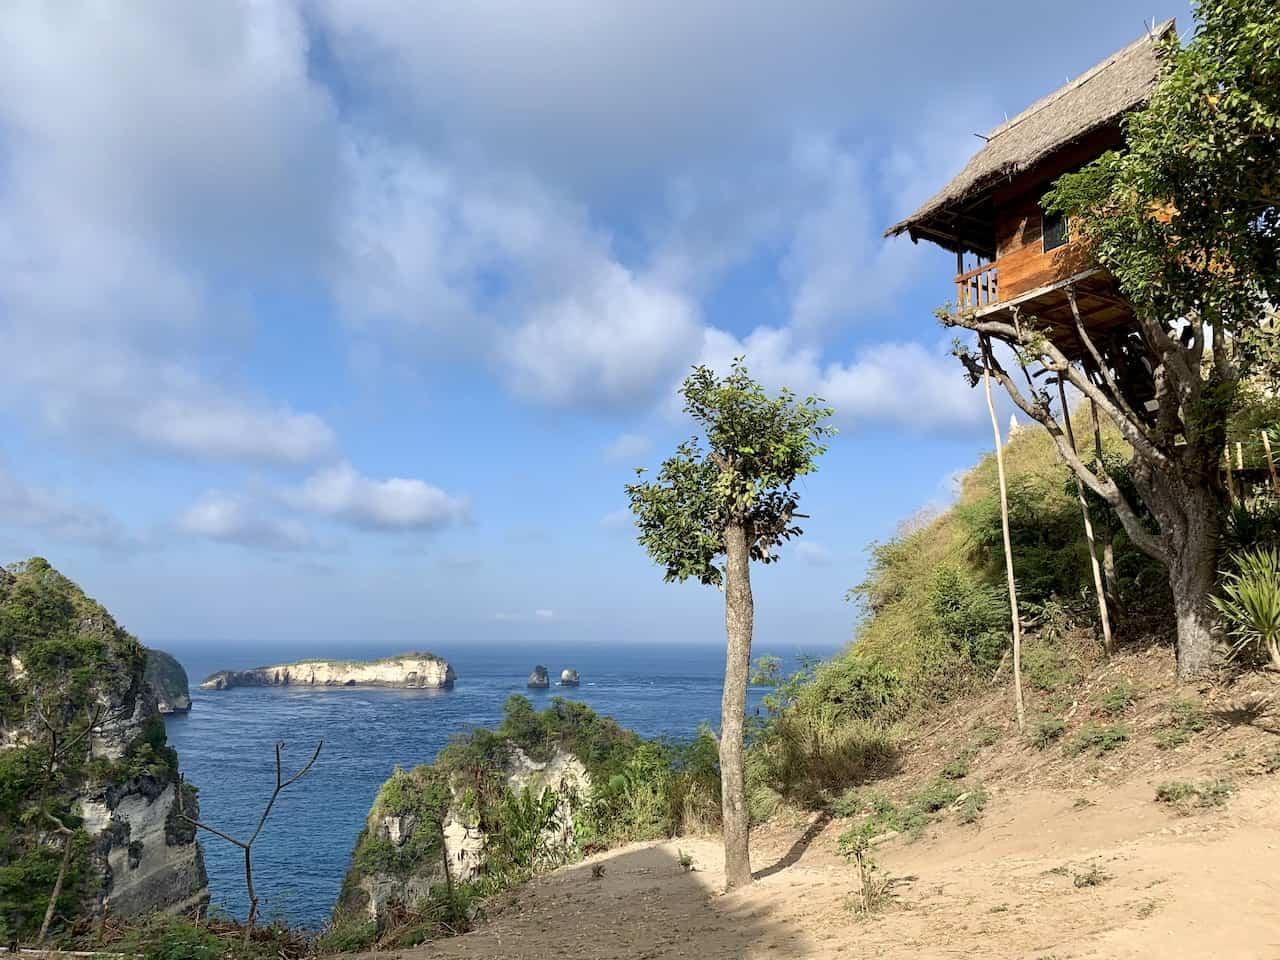 Rumah Pohon Tree House Nusa Penida Bali